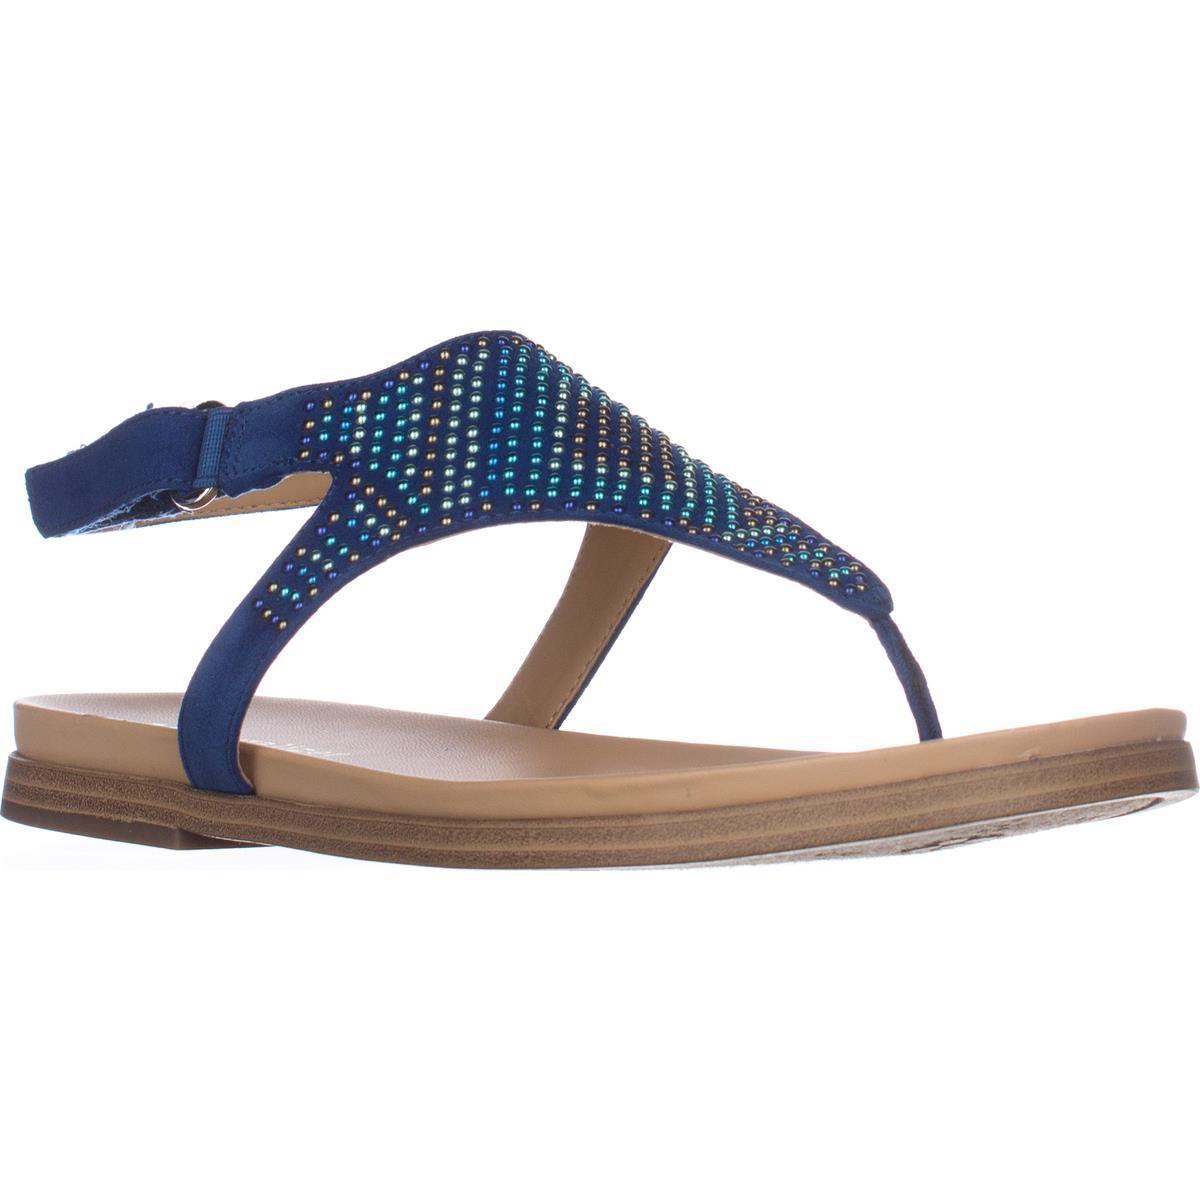 Womens Flats naturalizer Kelsie Flats Womens Sandals - Oceanic Blue 1756ea